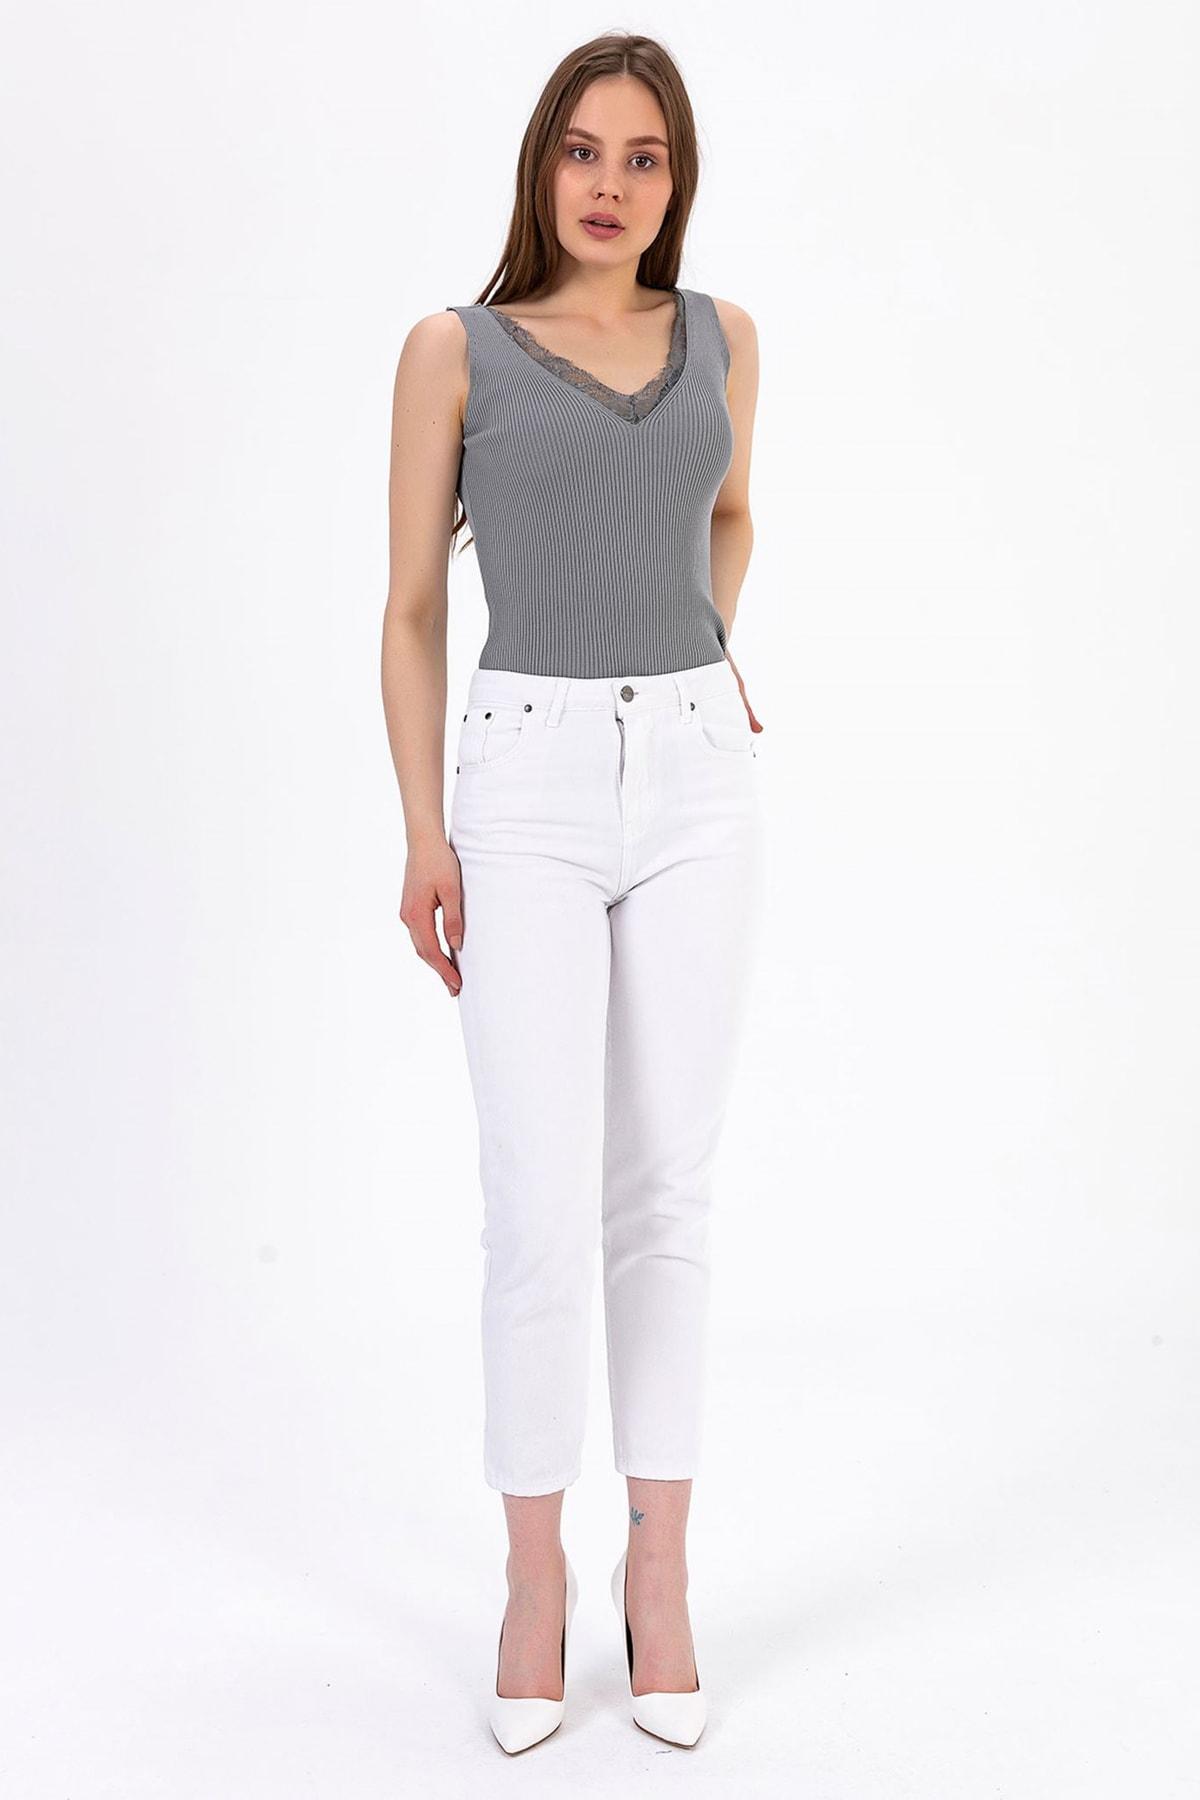 TIFFANY&TOMATO Kadın Beyaz Mom Jeans Pantolon A0055Y833T 1